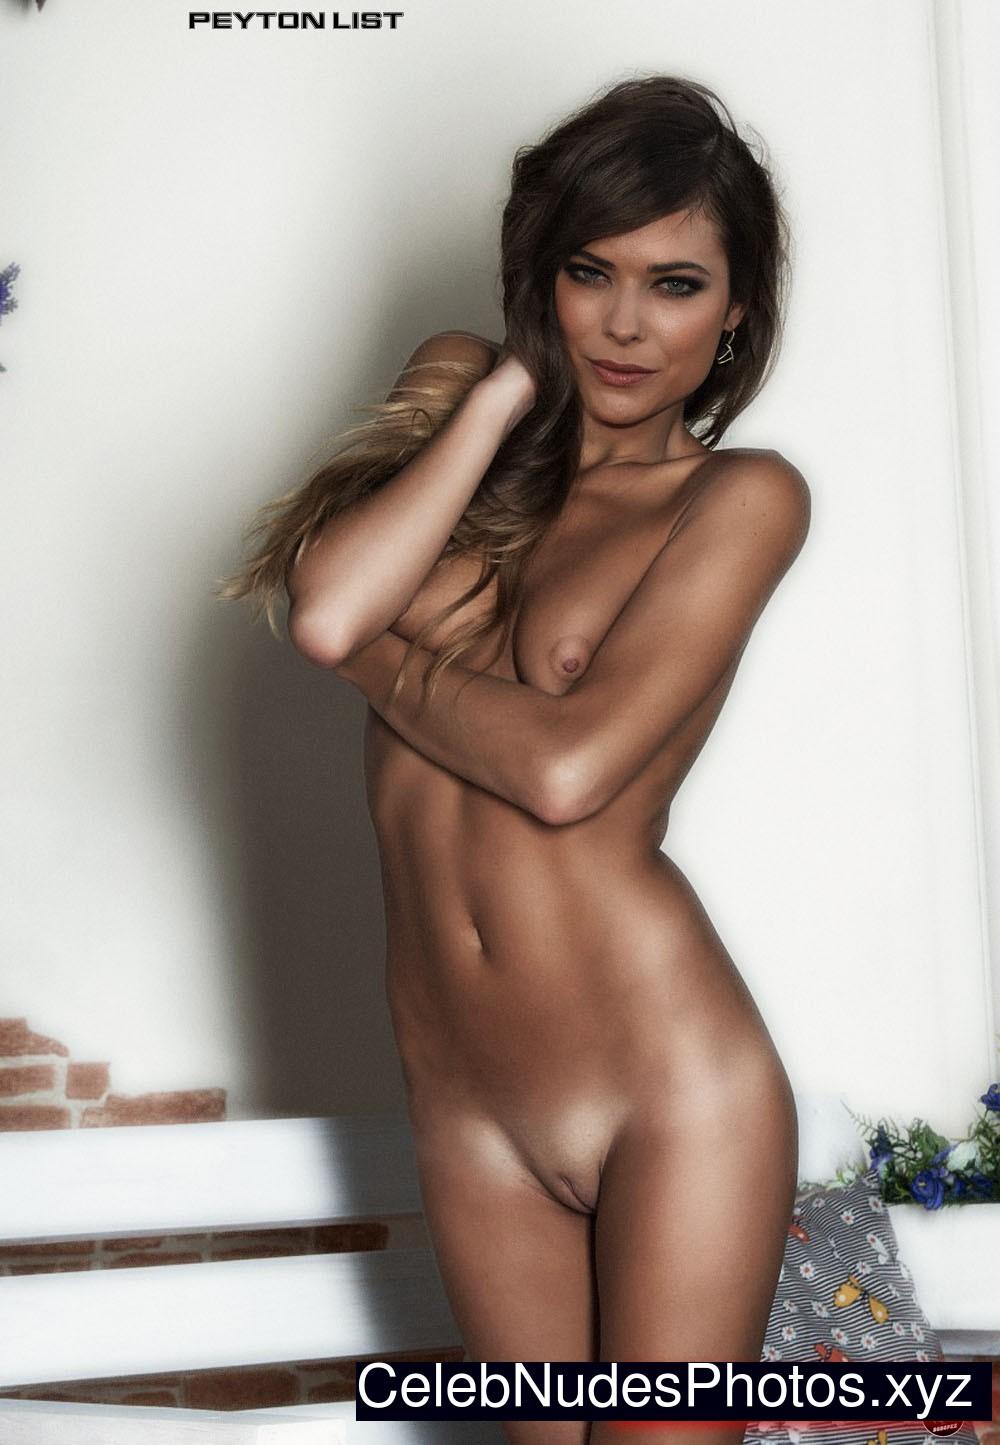 peyton list almost naked